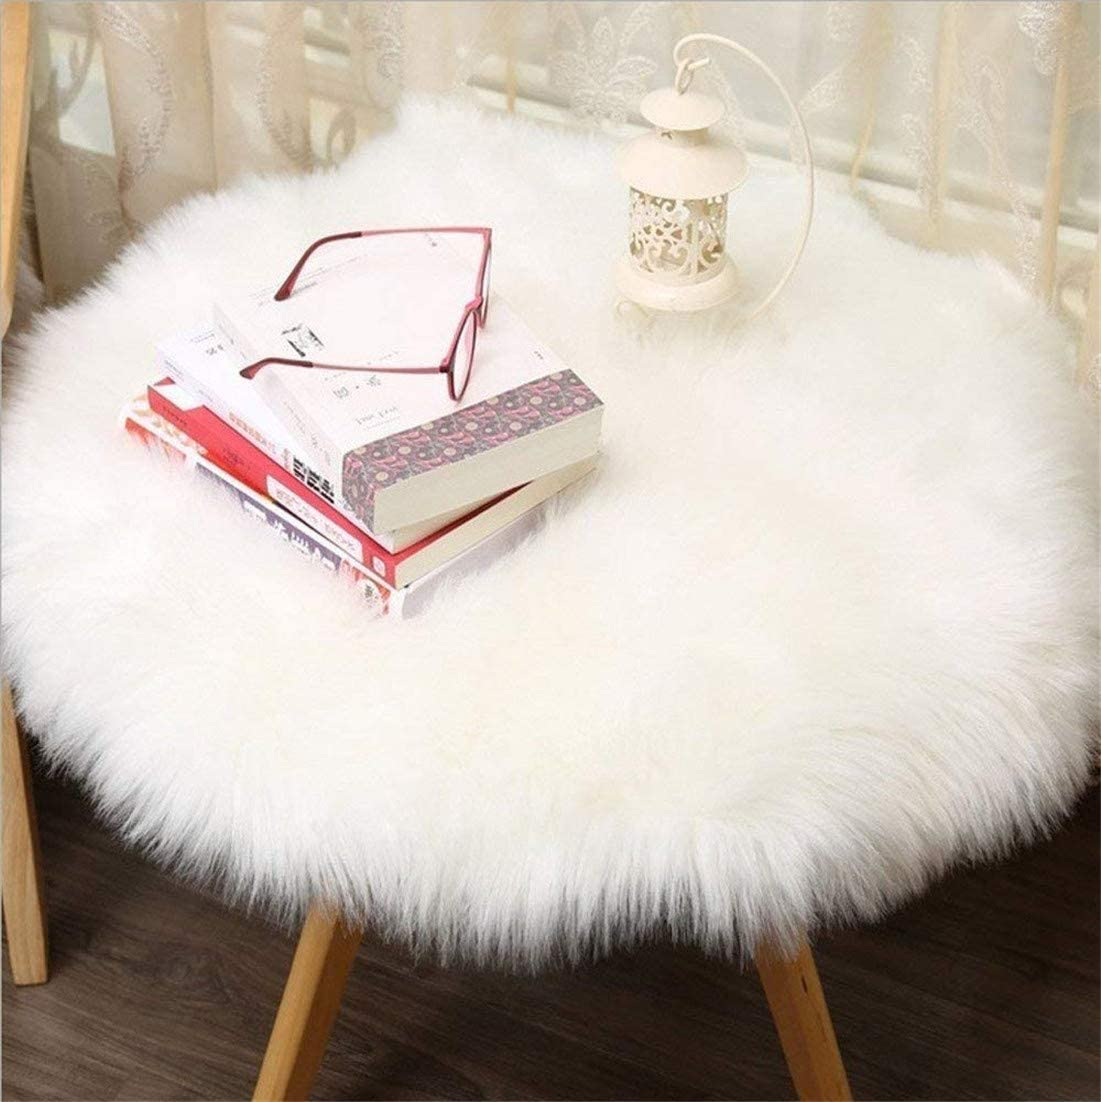 HEQUN Circular Faux Fur Sheepskin Style Rug Faux Fleece Chair Cover Seat Pad Soft Fluffy Shaggy Area Rugs For Bedroom Sofa Floor (White, 60 X 60 CM)